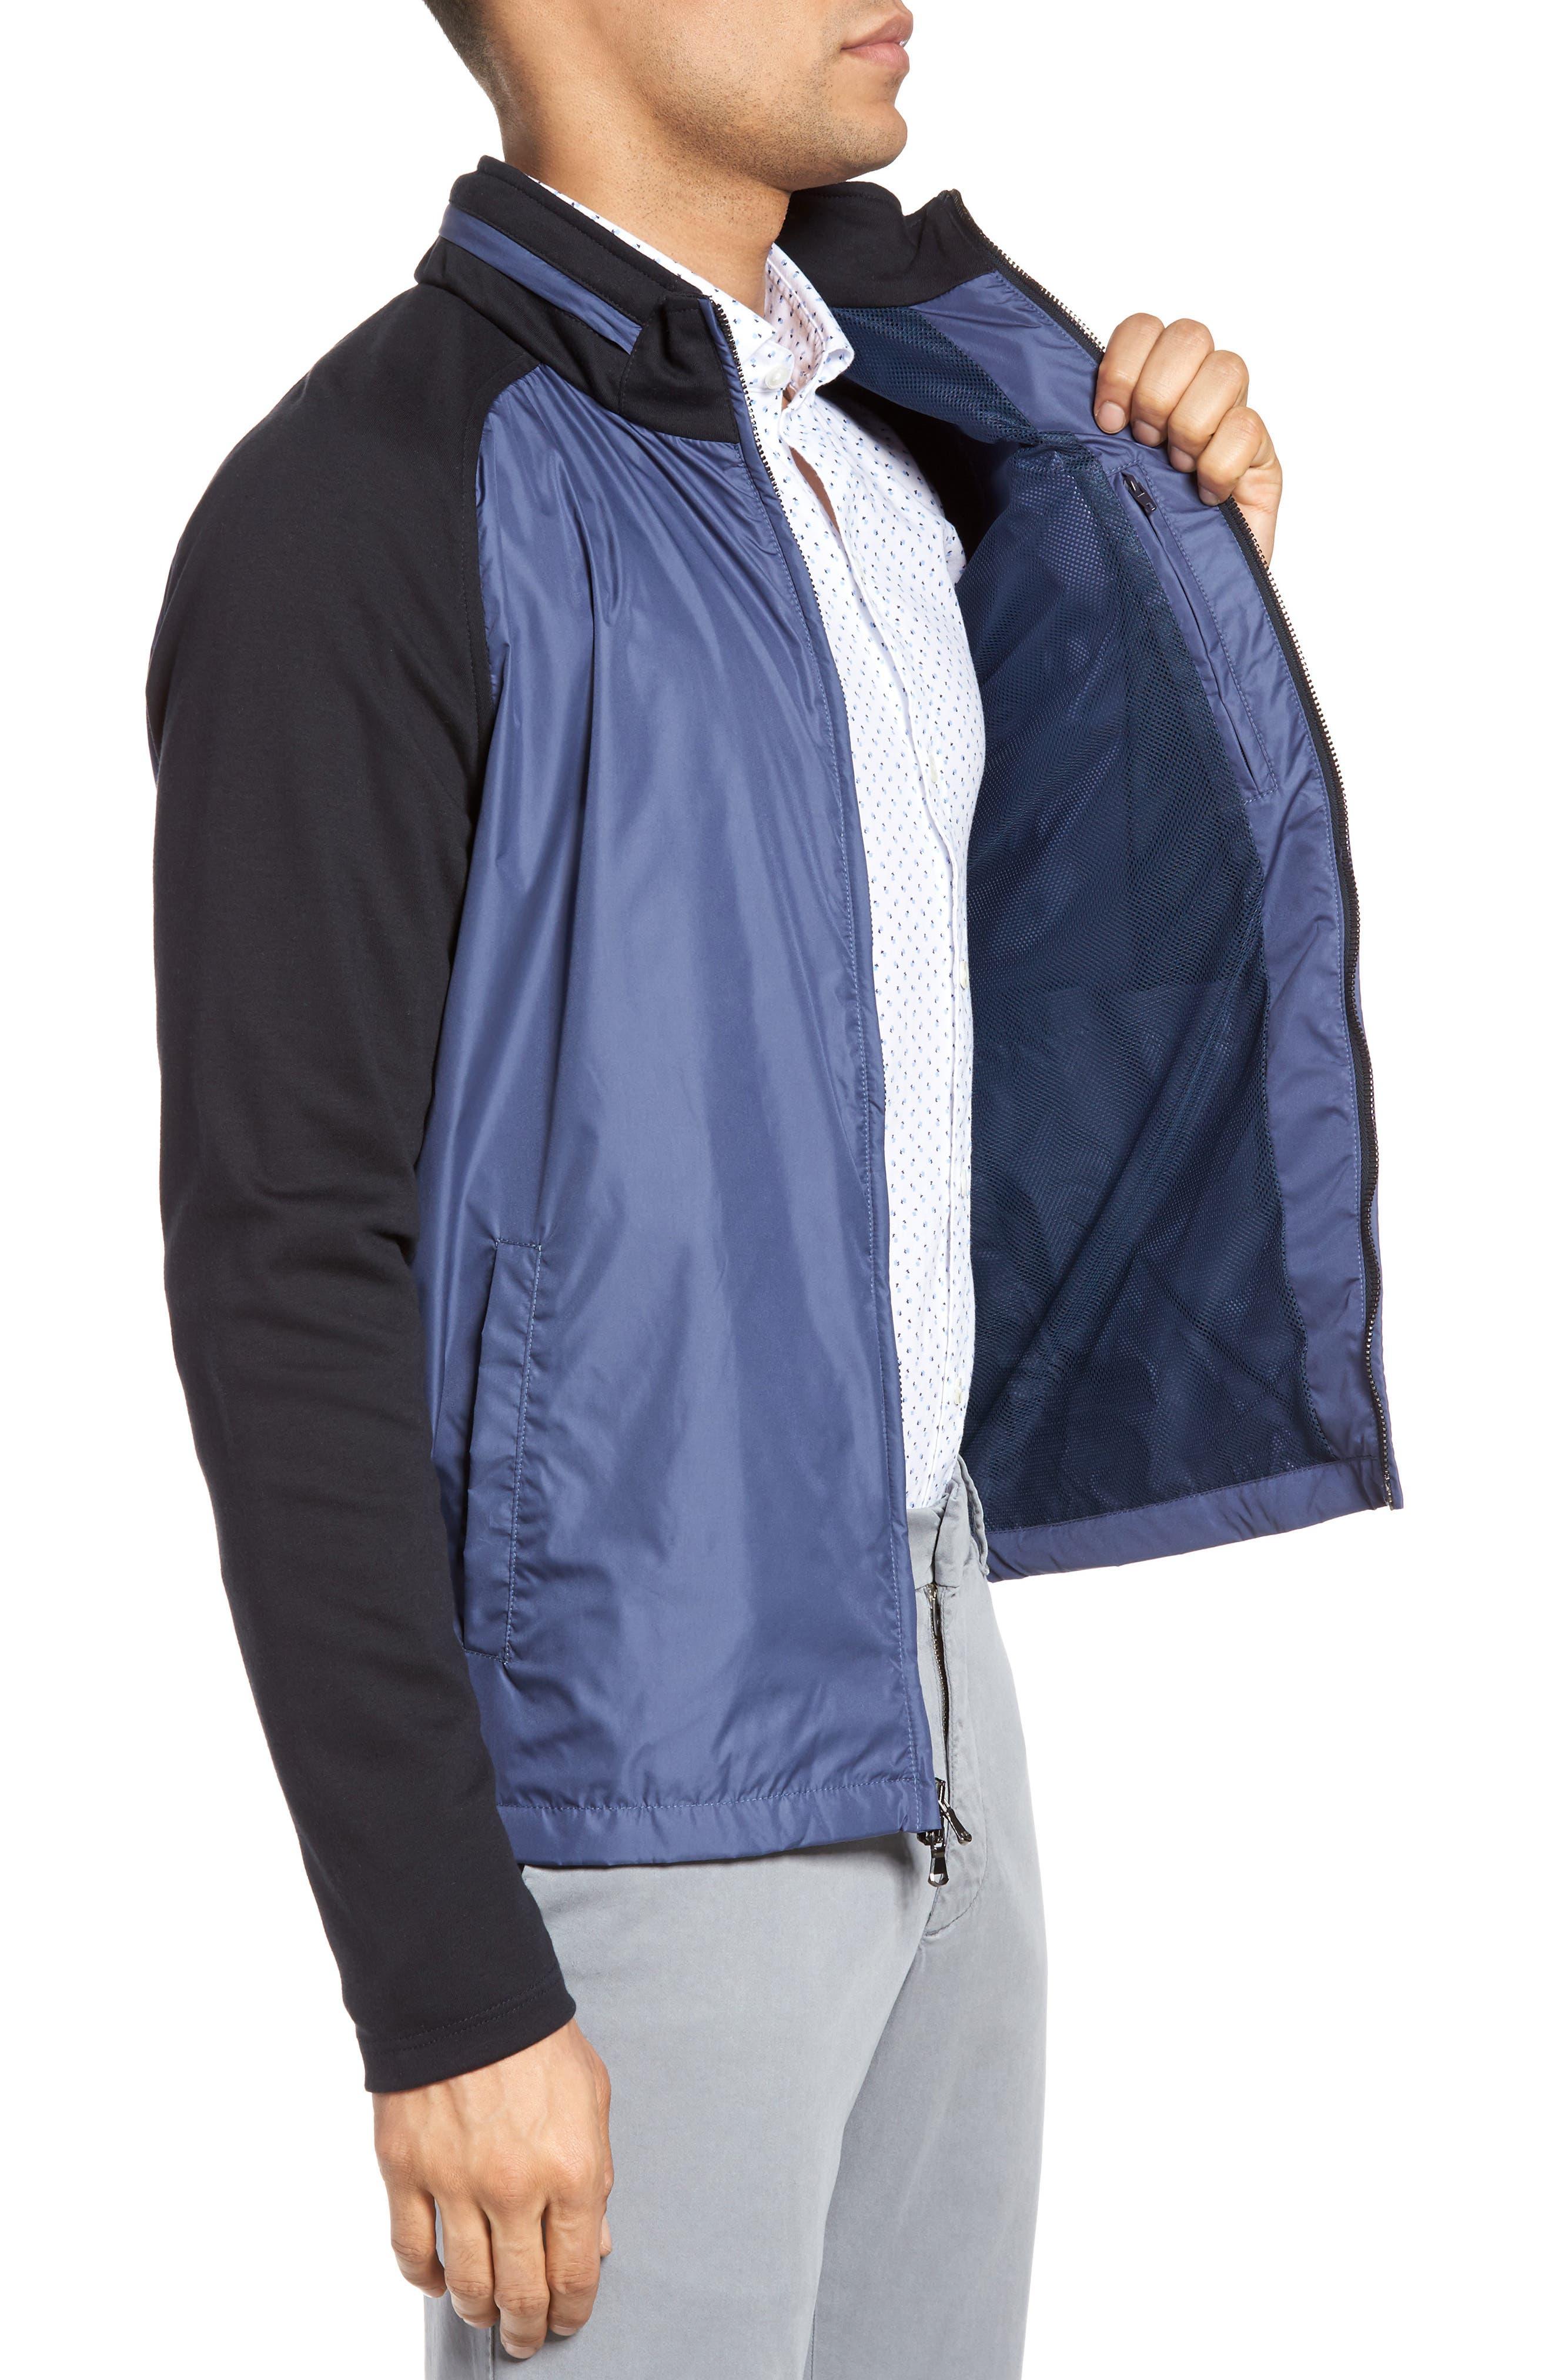 Syconium Mixed Media Zip Front Jacket,                             Alternate thumbnail 3, color,                             400